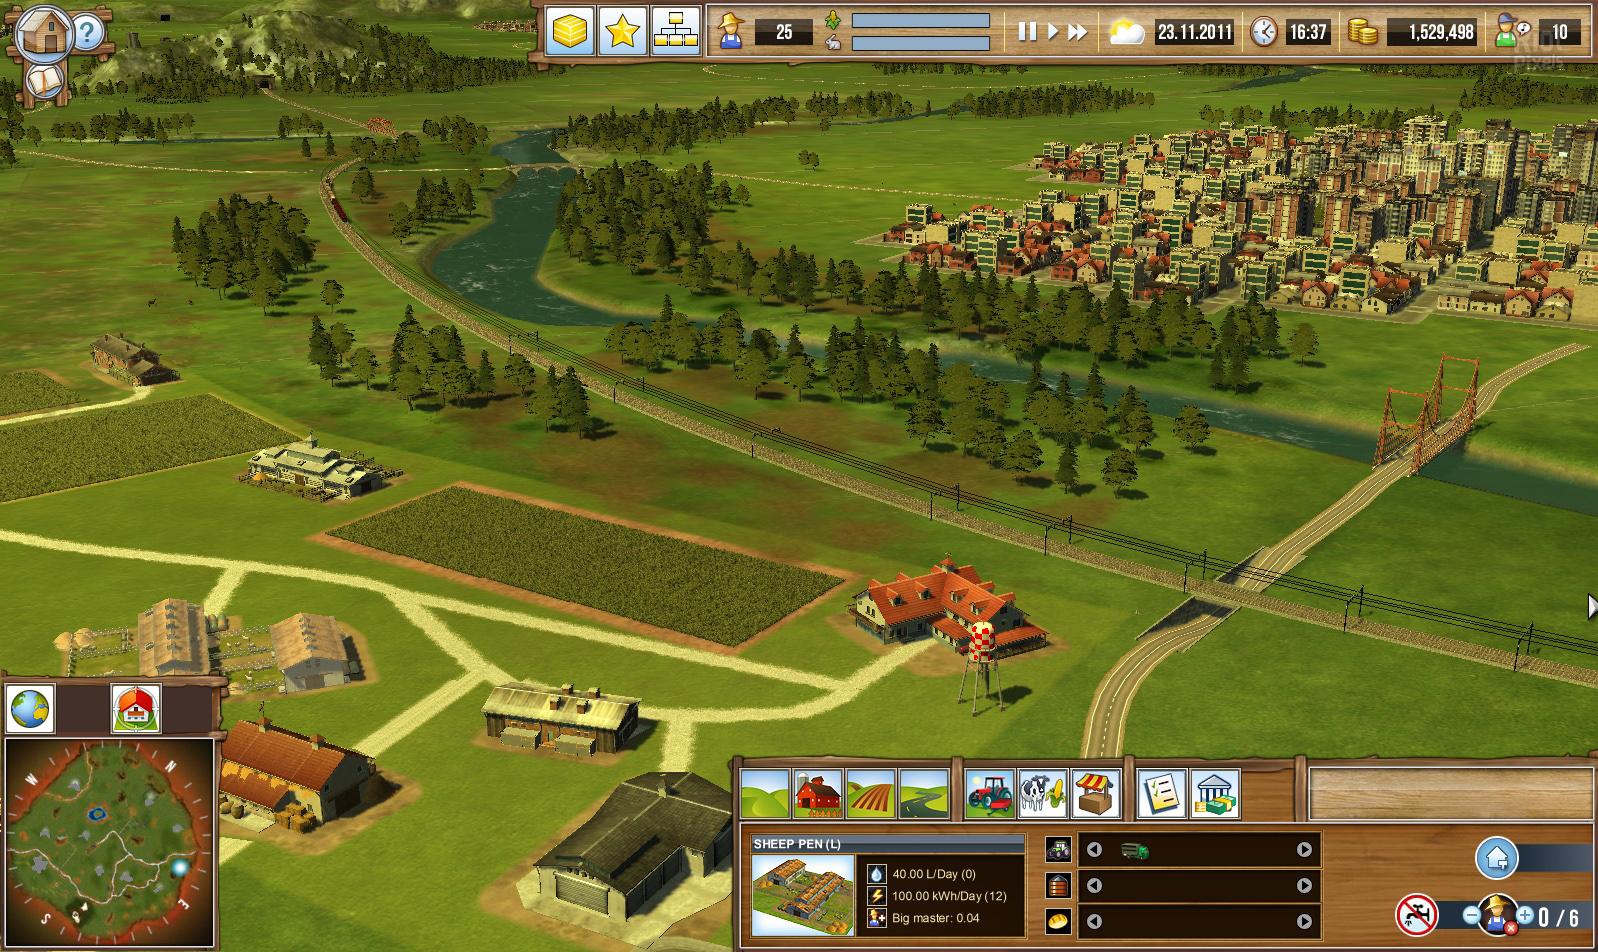 Landwirtschafts simulator 2011 farming simulator 2011 bizon gigant z 060 mod download specializations